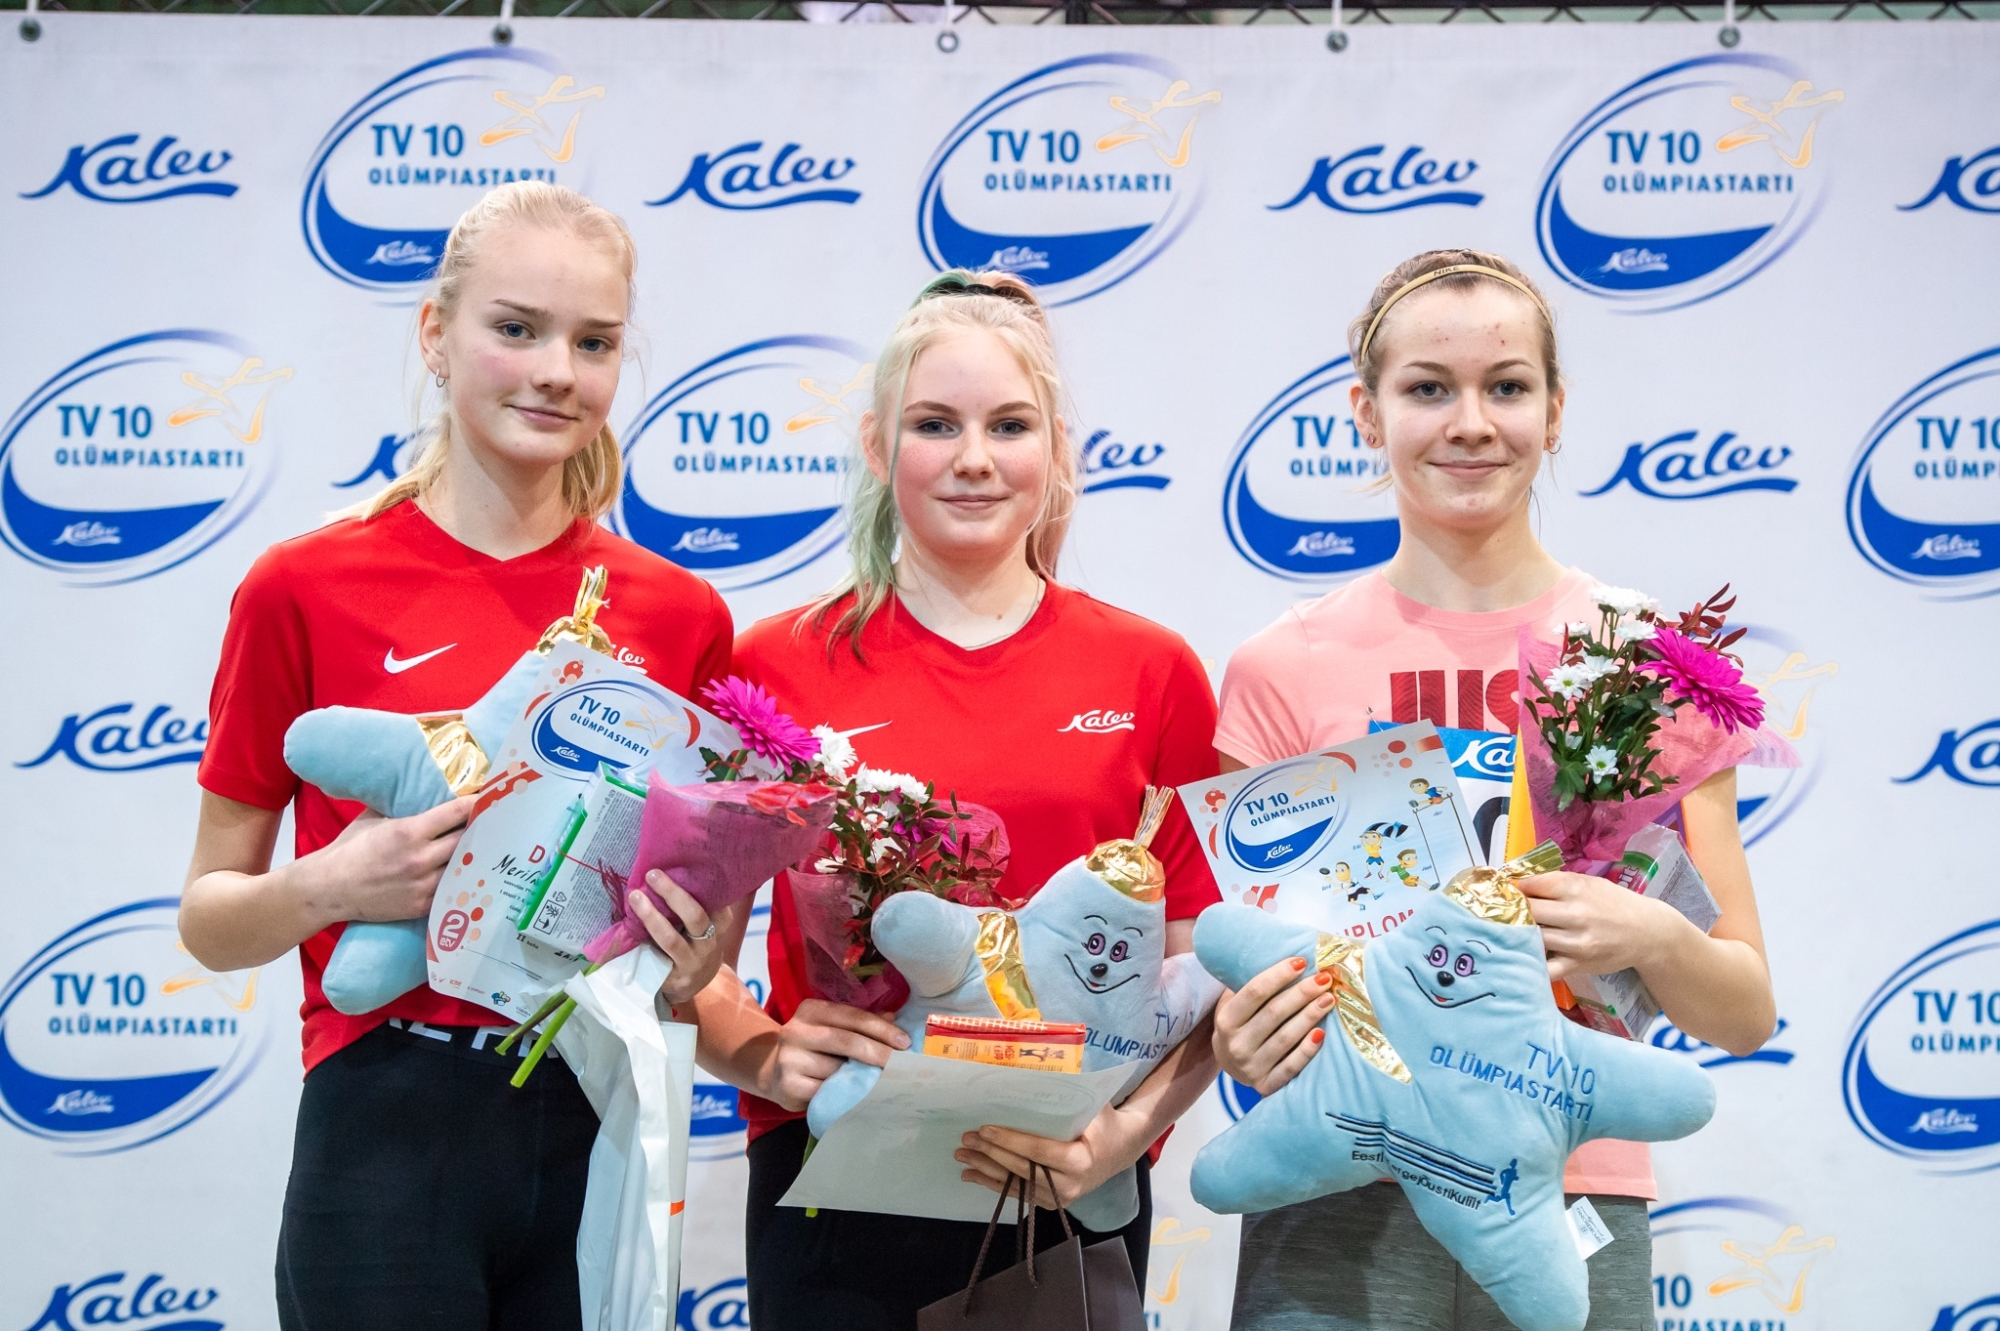 TV 10 olümpiastardi 1. etapil olid parimad Kevin Matteus ja Karen Loorens